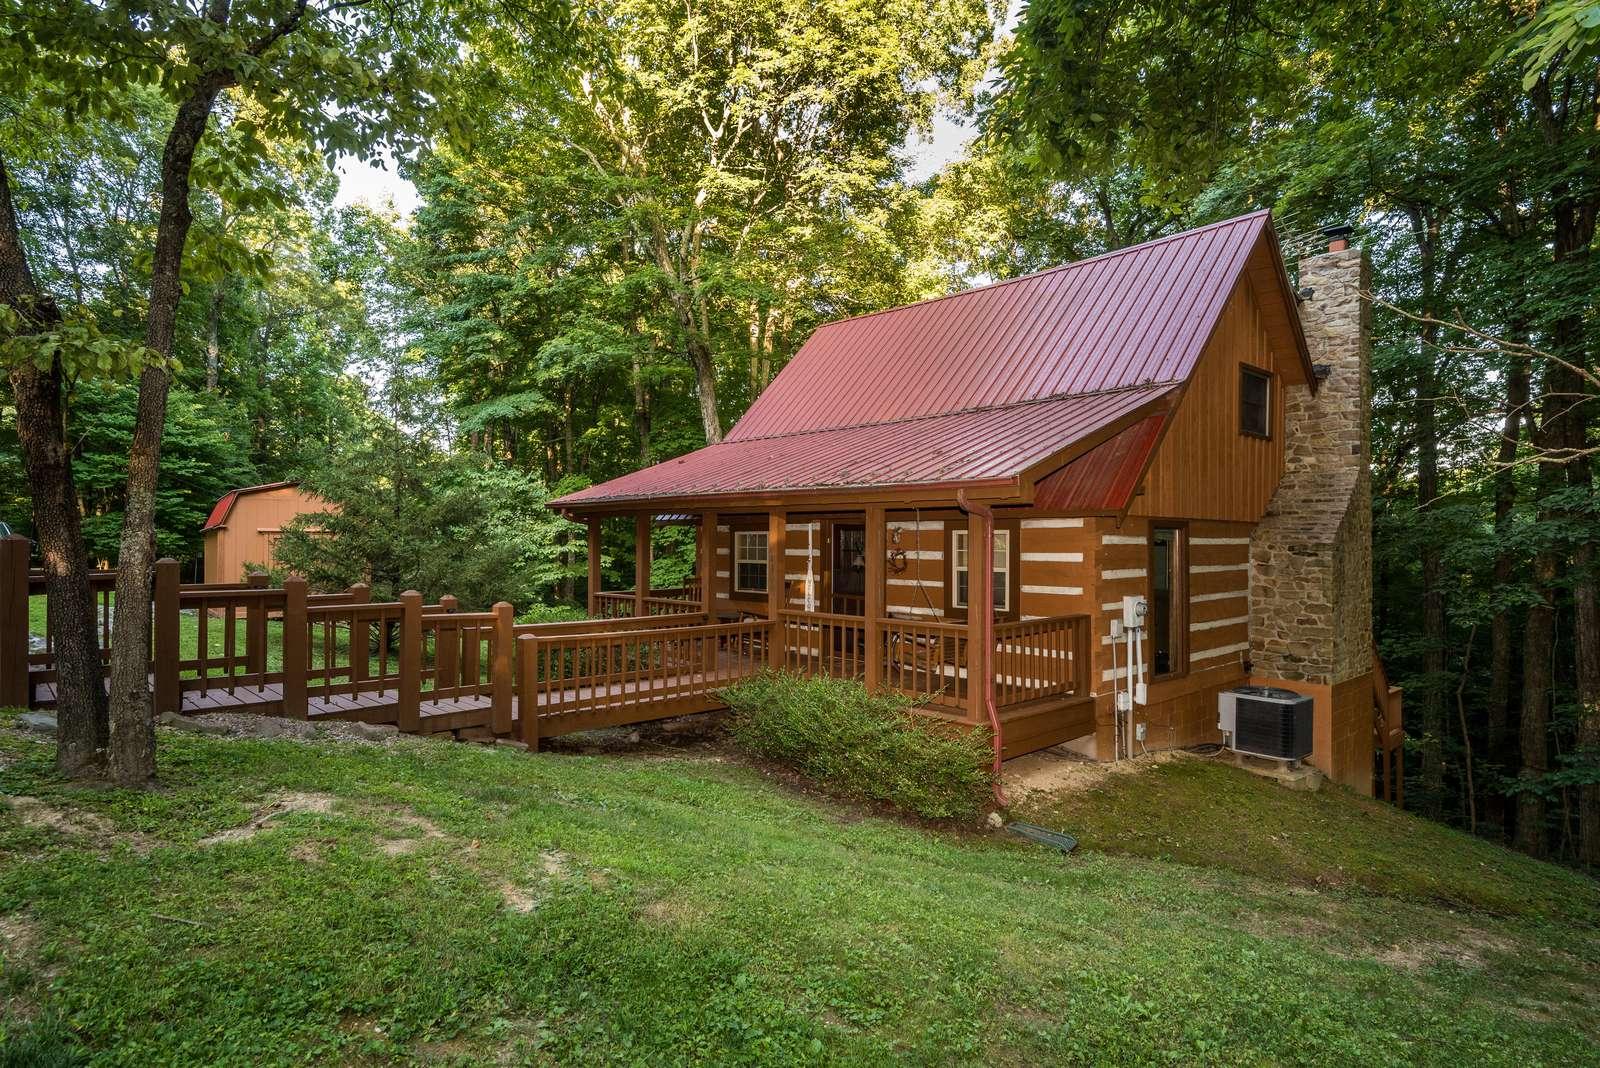 Snoozing Moose Log Cabin - property